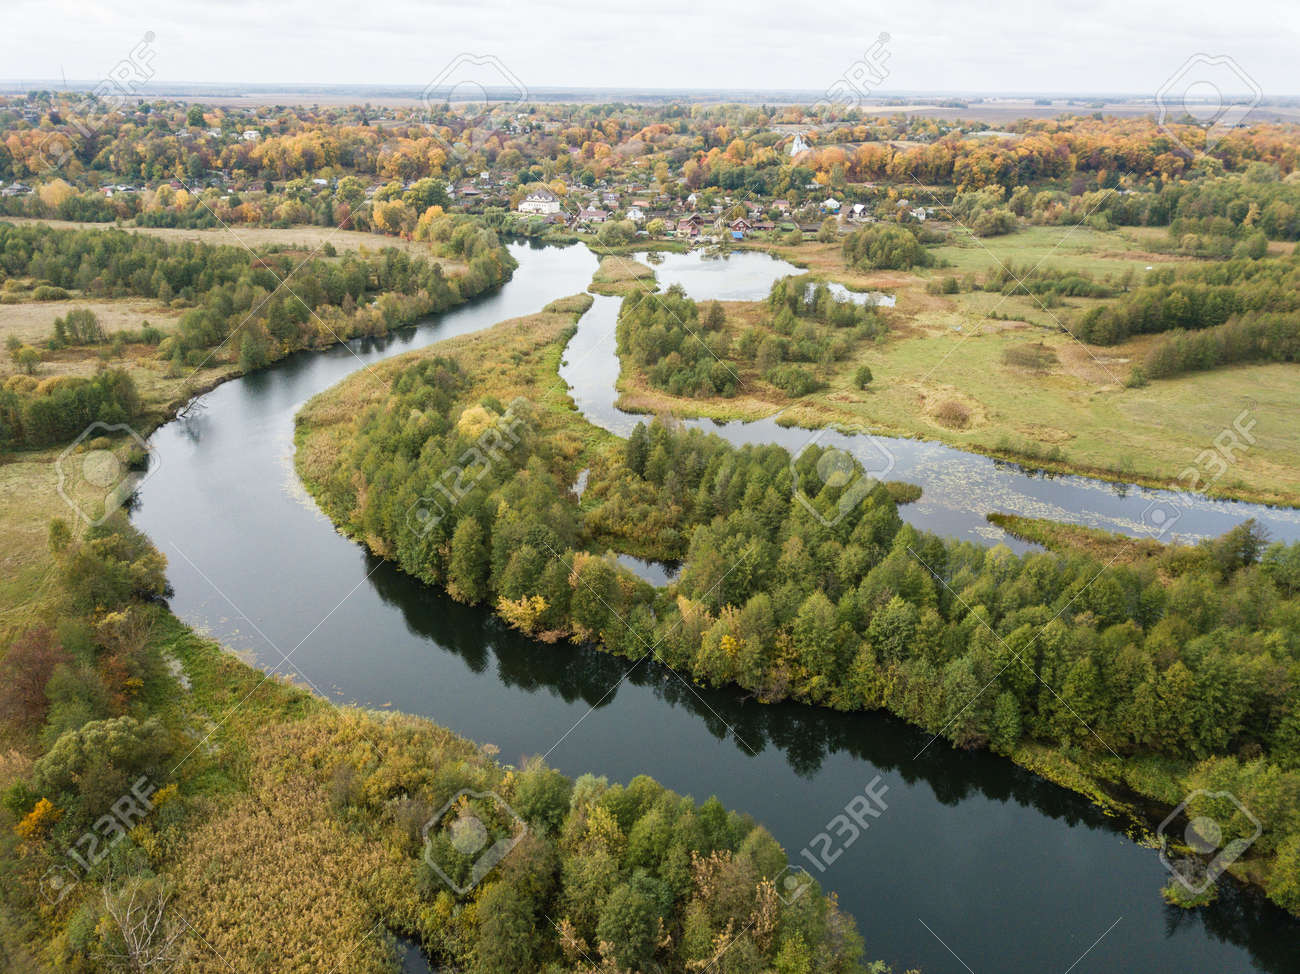 Aerial view of river Snov in autumn near village of Sednev, Chernihiv region, Ukraine. - 167297955